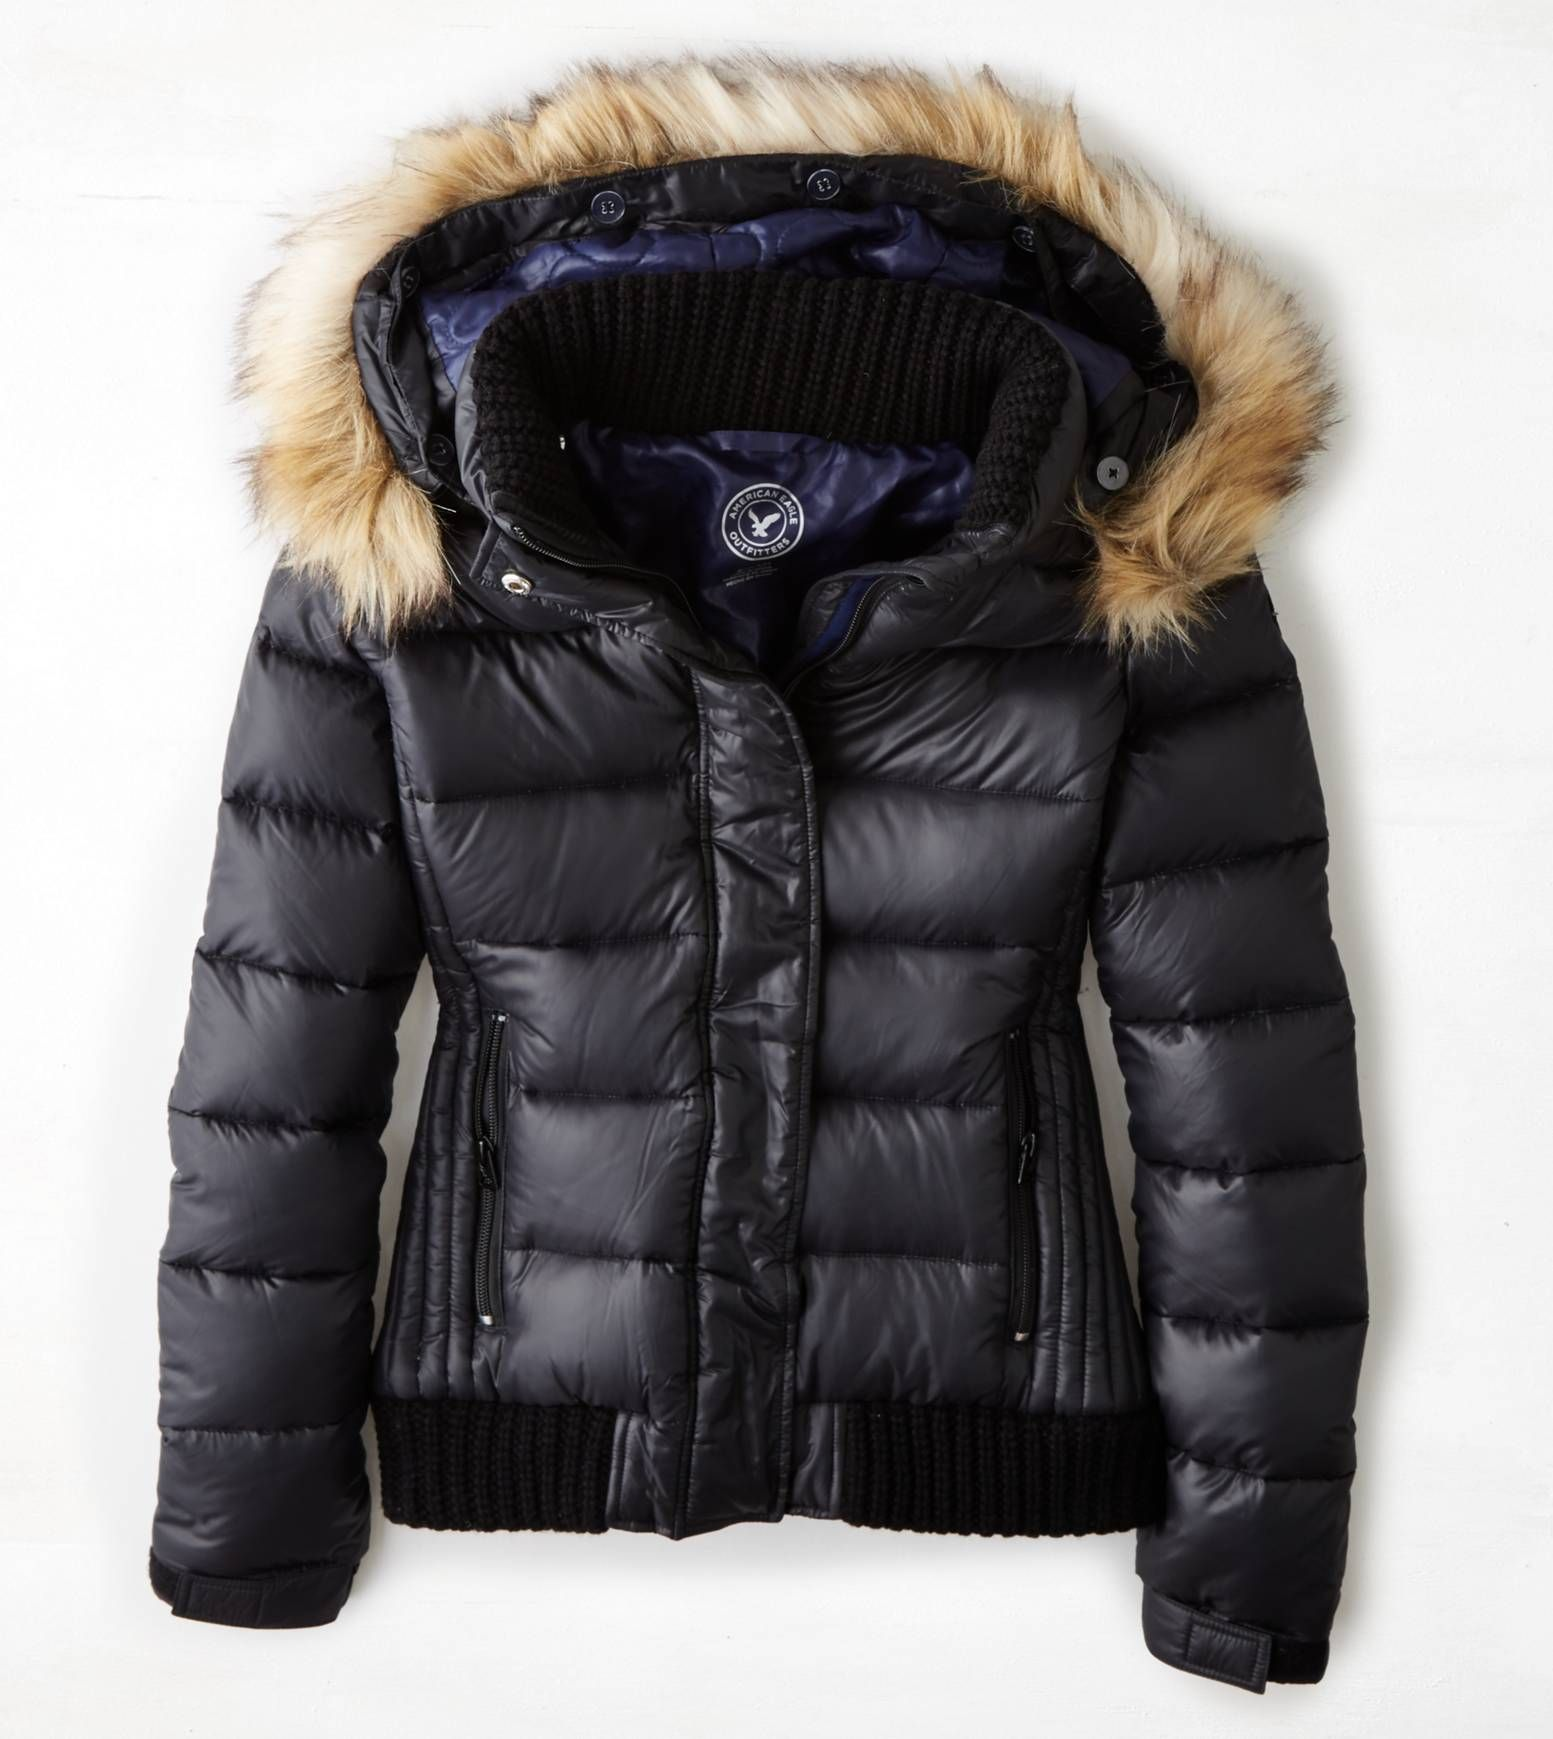 True Black Aeo Get Down Hooded Puffer Jacket Jackets Fashion Puffer Jackets [ 1739 x 1553 Pixel ]